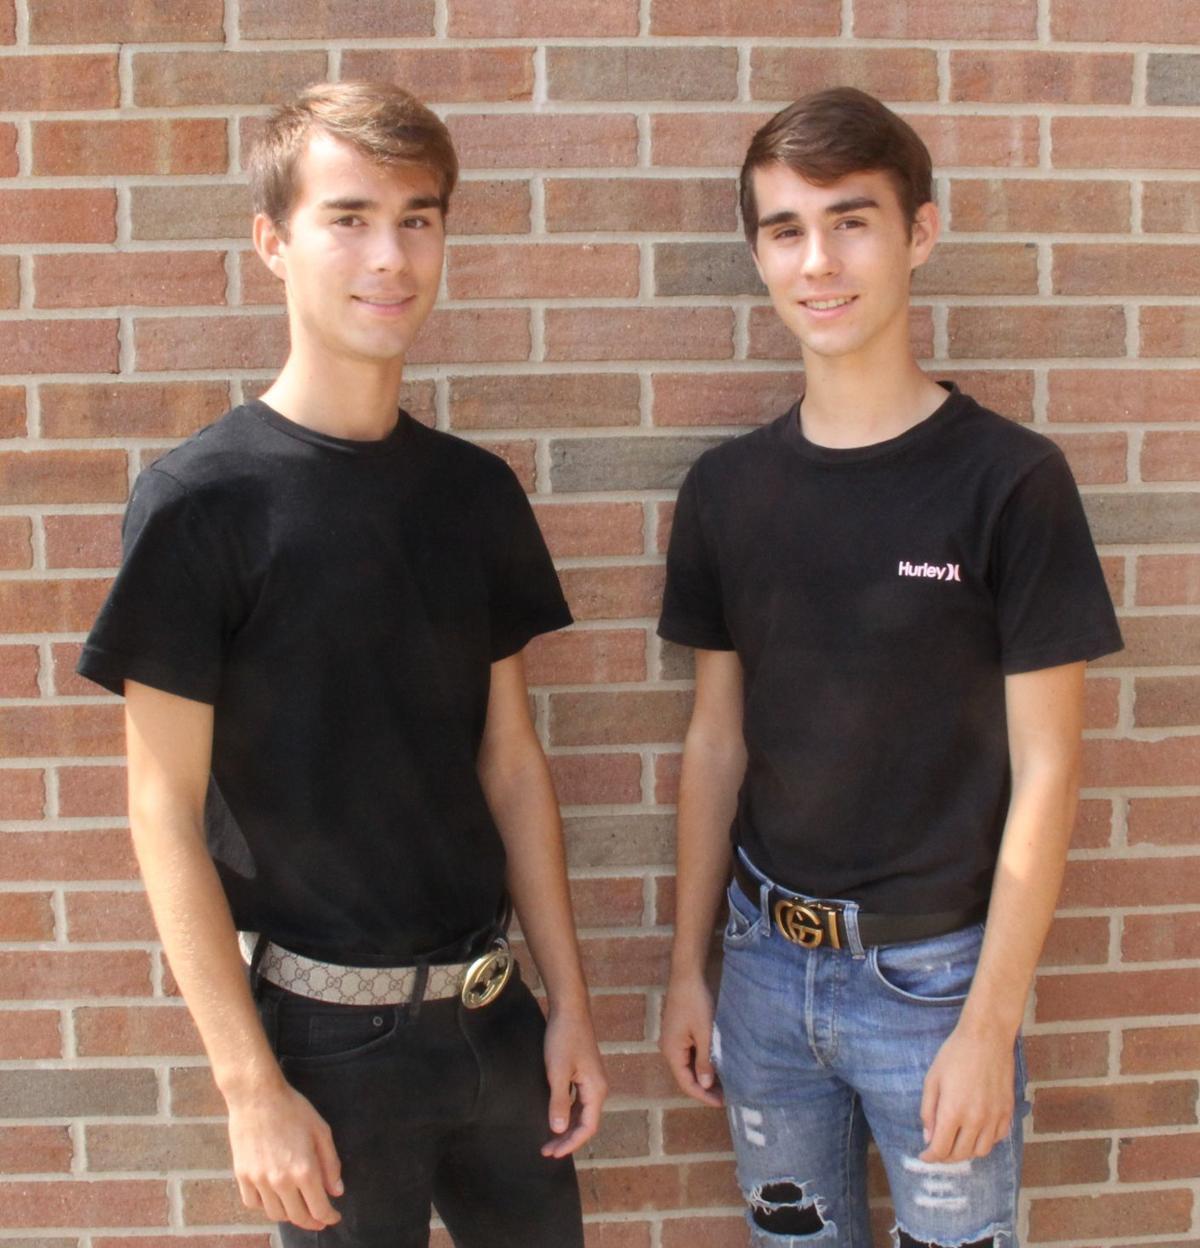 Braden and Brock Vinson